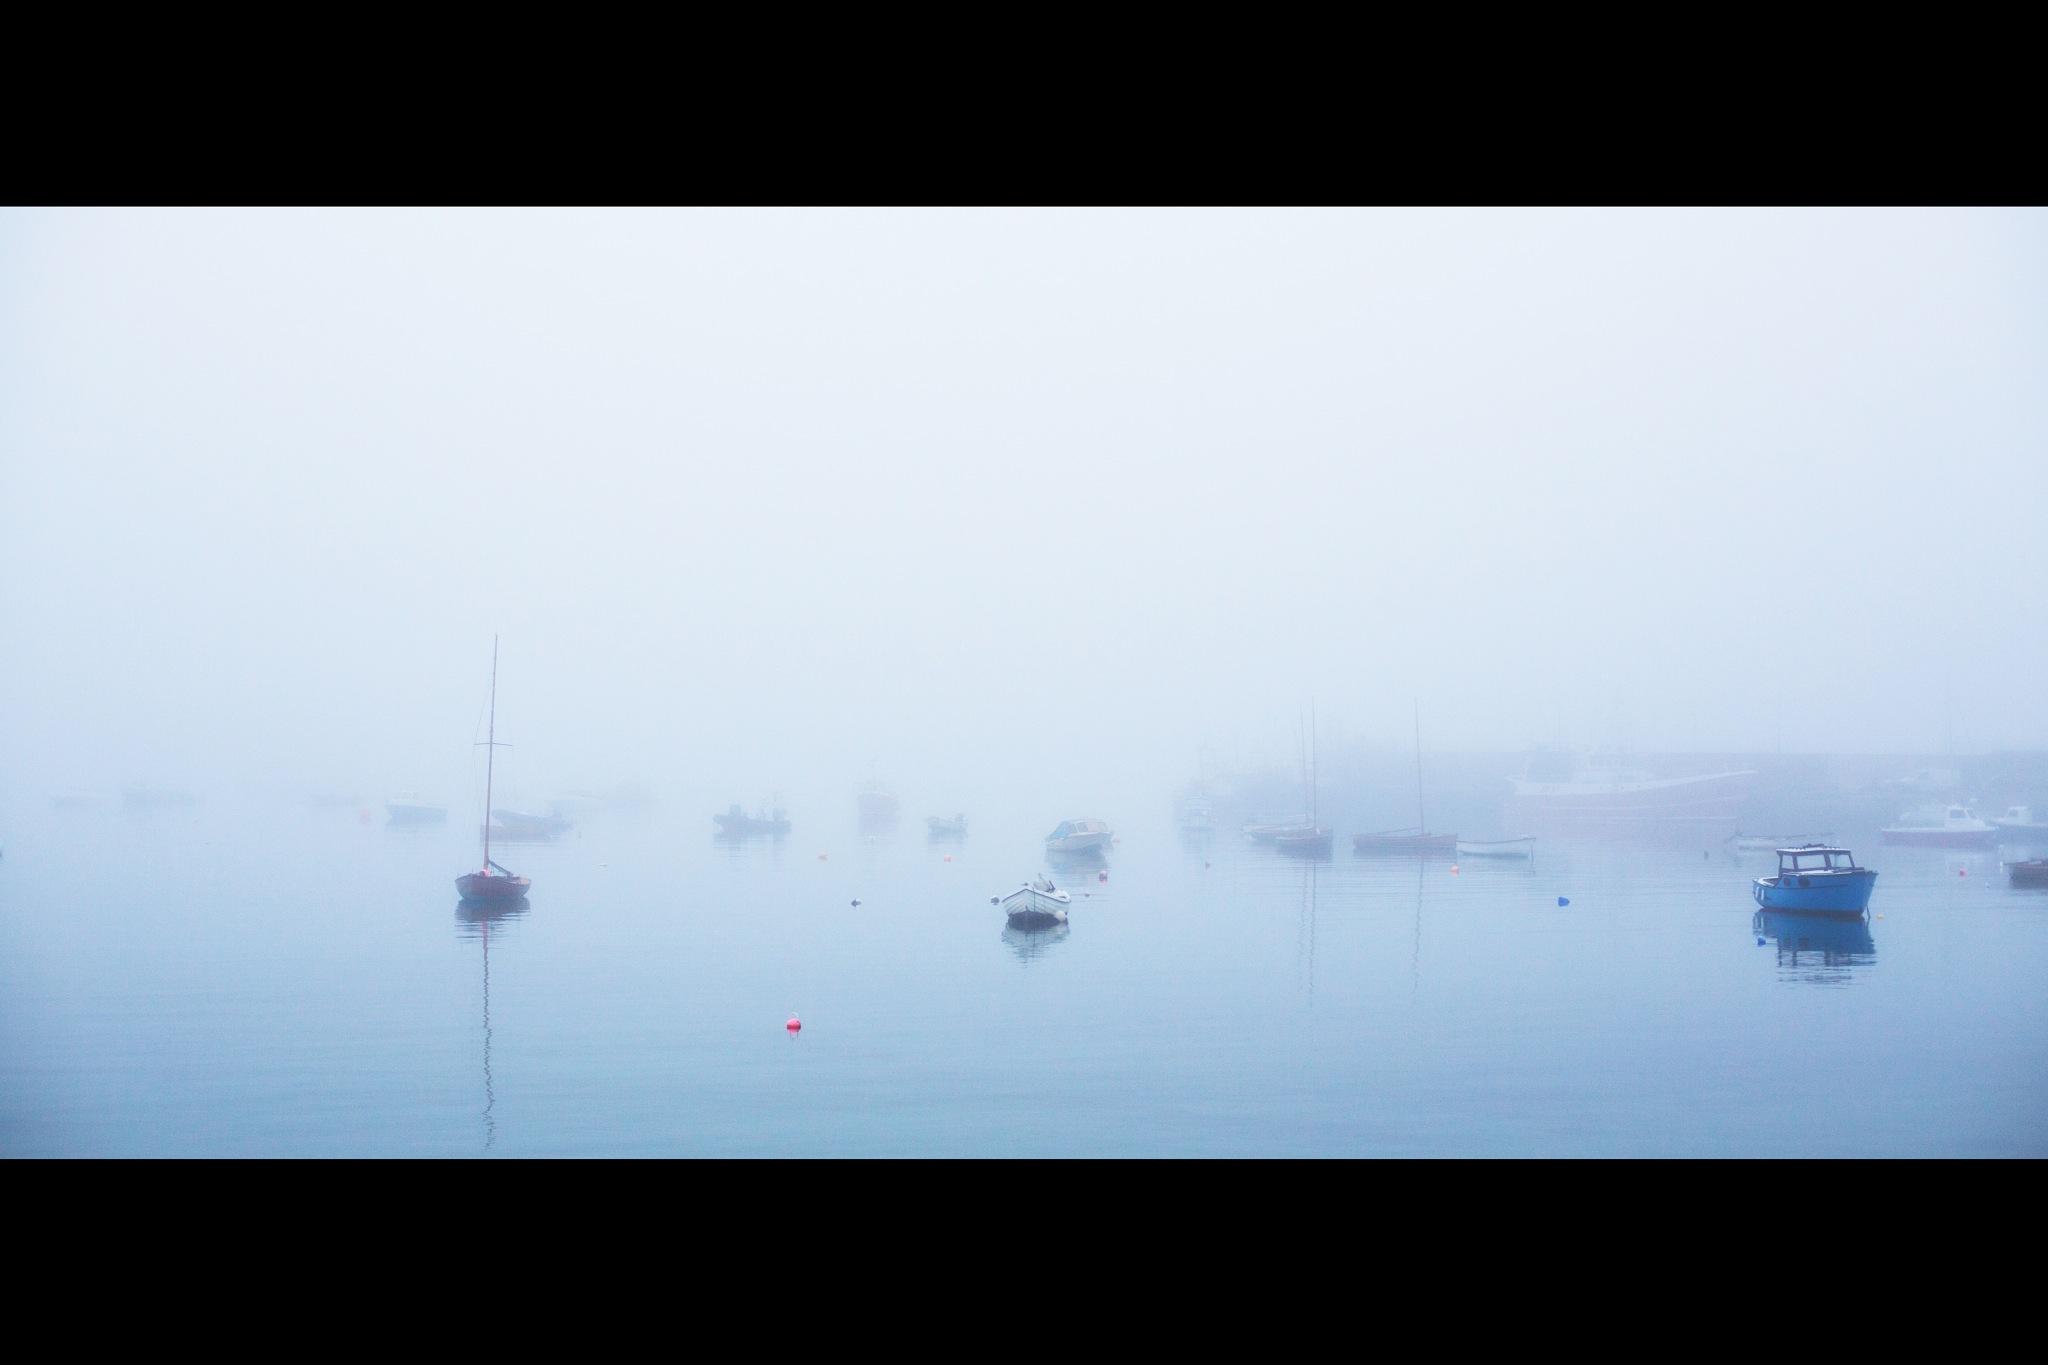 Foggy Bay by John Morgan